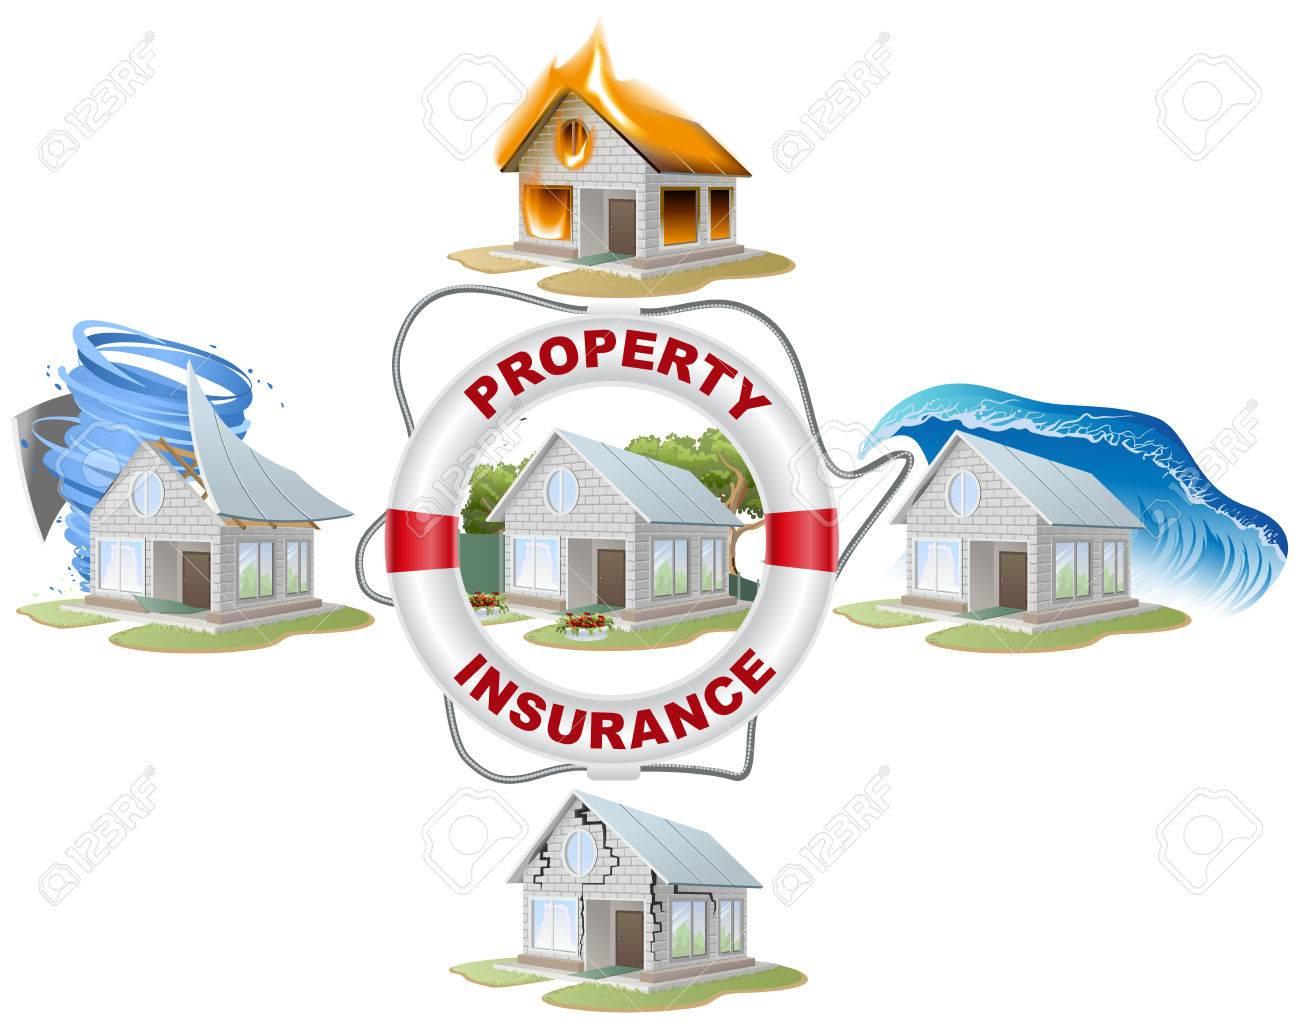 Home insurance. Property insurance. Lifebuoy, fire, flood, tornado. Vector illustration the concept of insurance. - 44427648